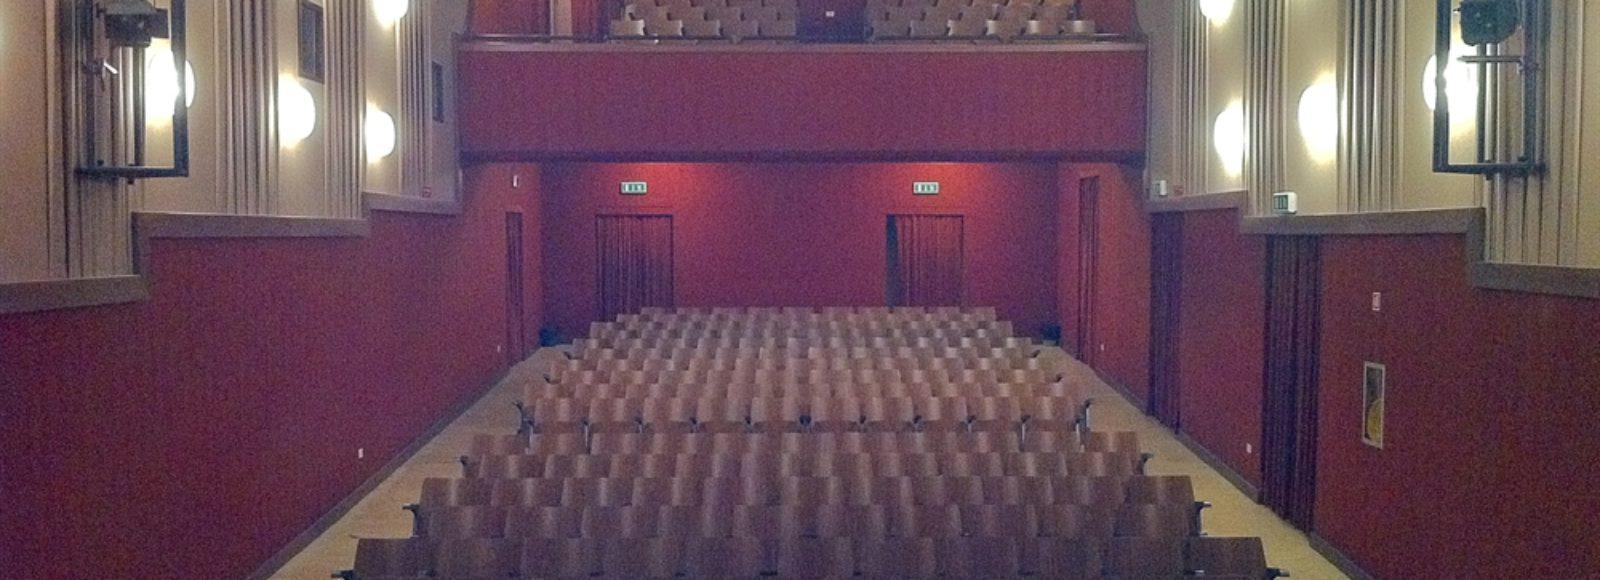 teatro parrocchiale sopramonte